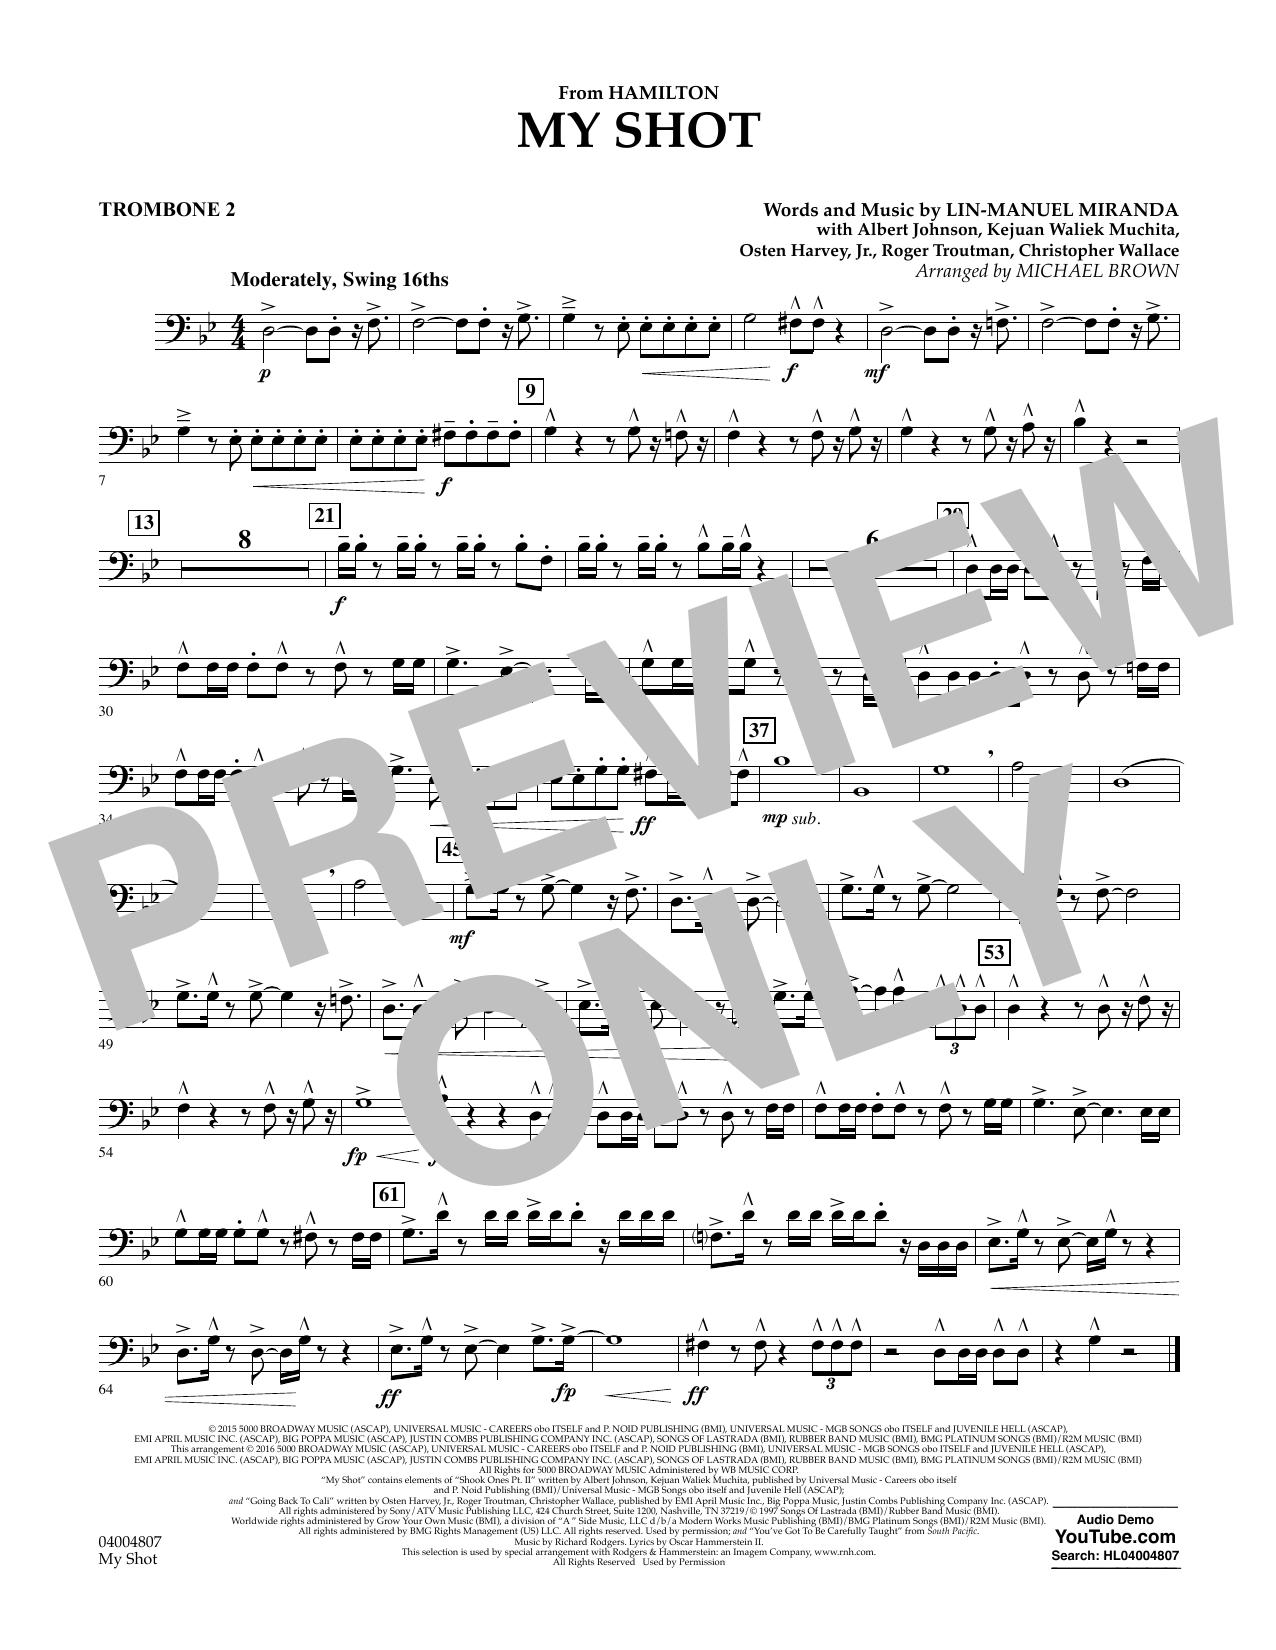 My Shot (from Hamilton) - Trombone 2 Sheet Music